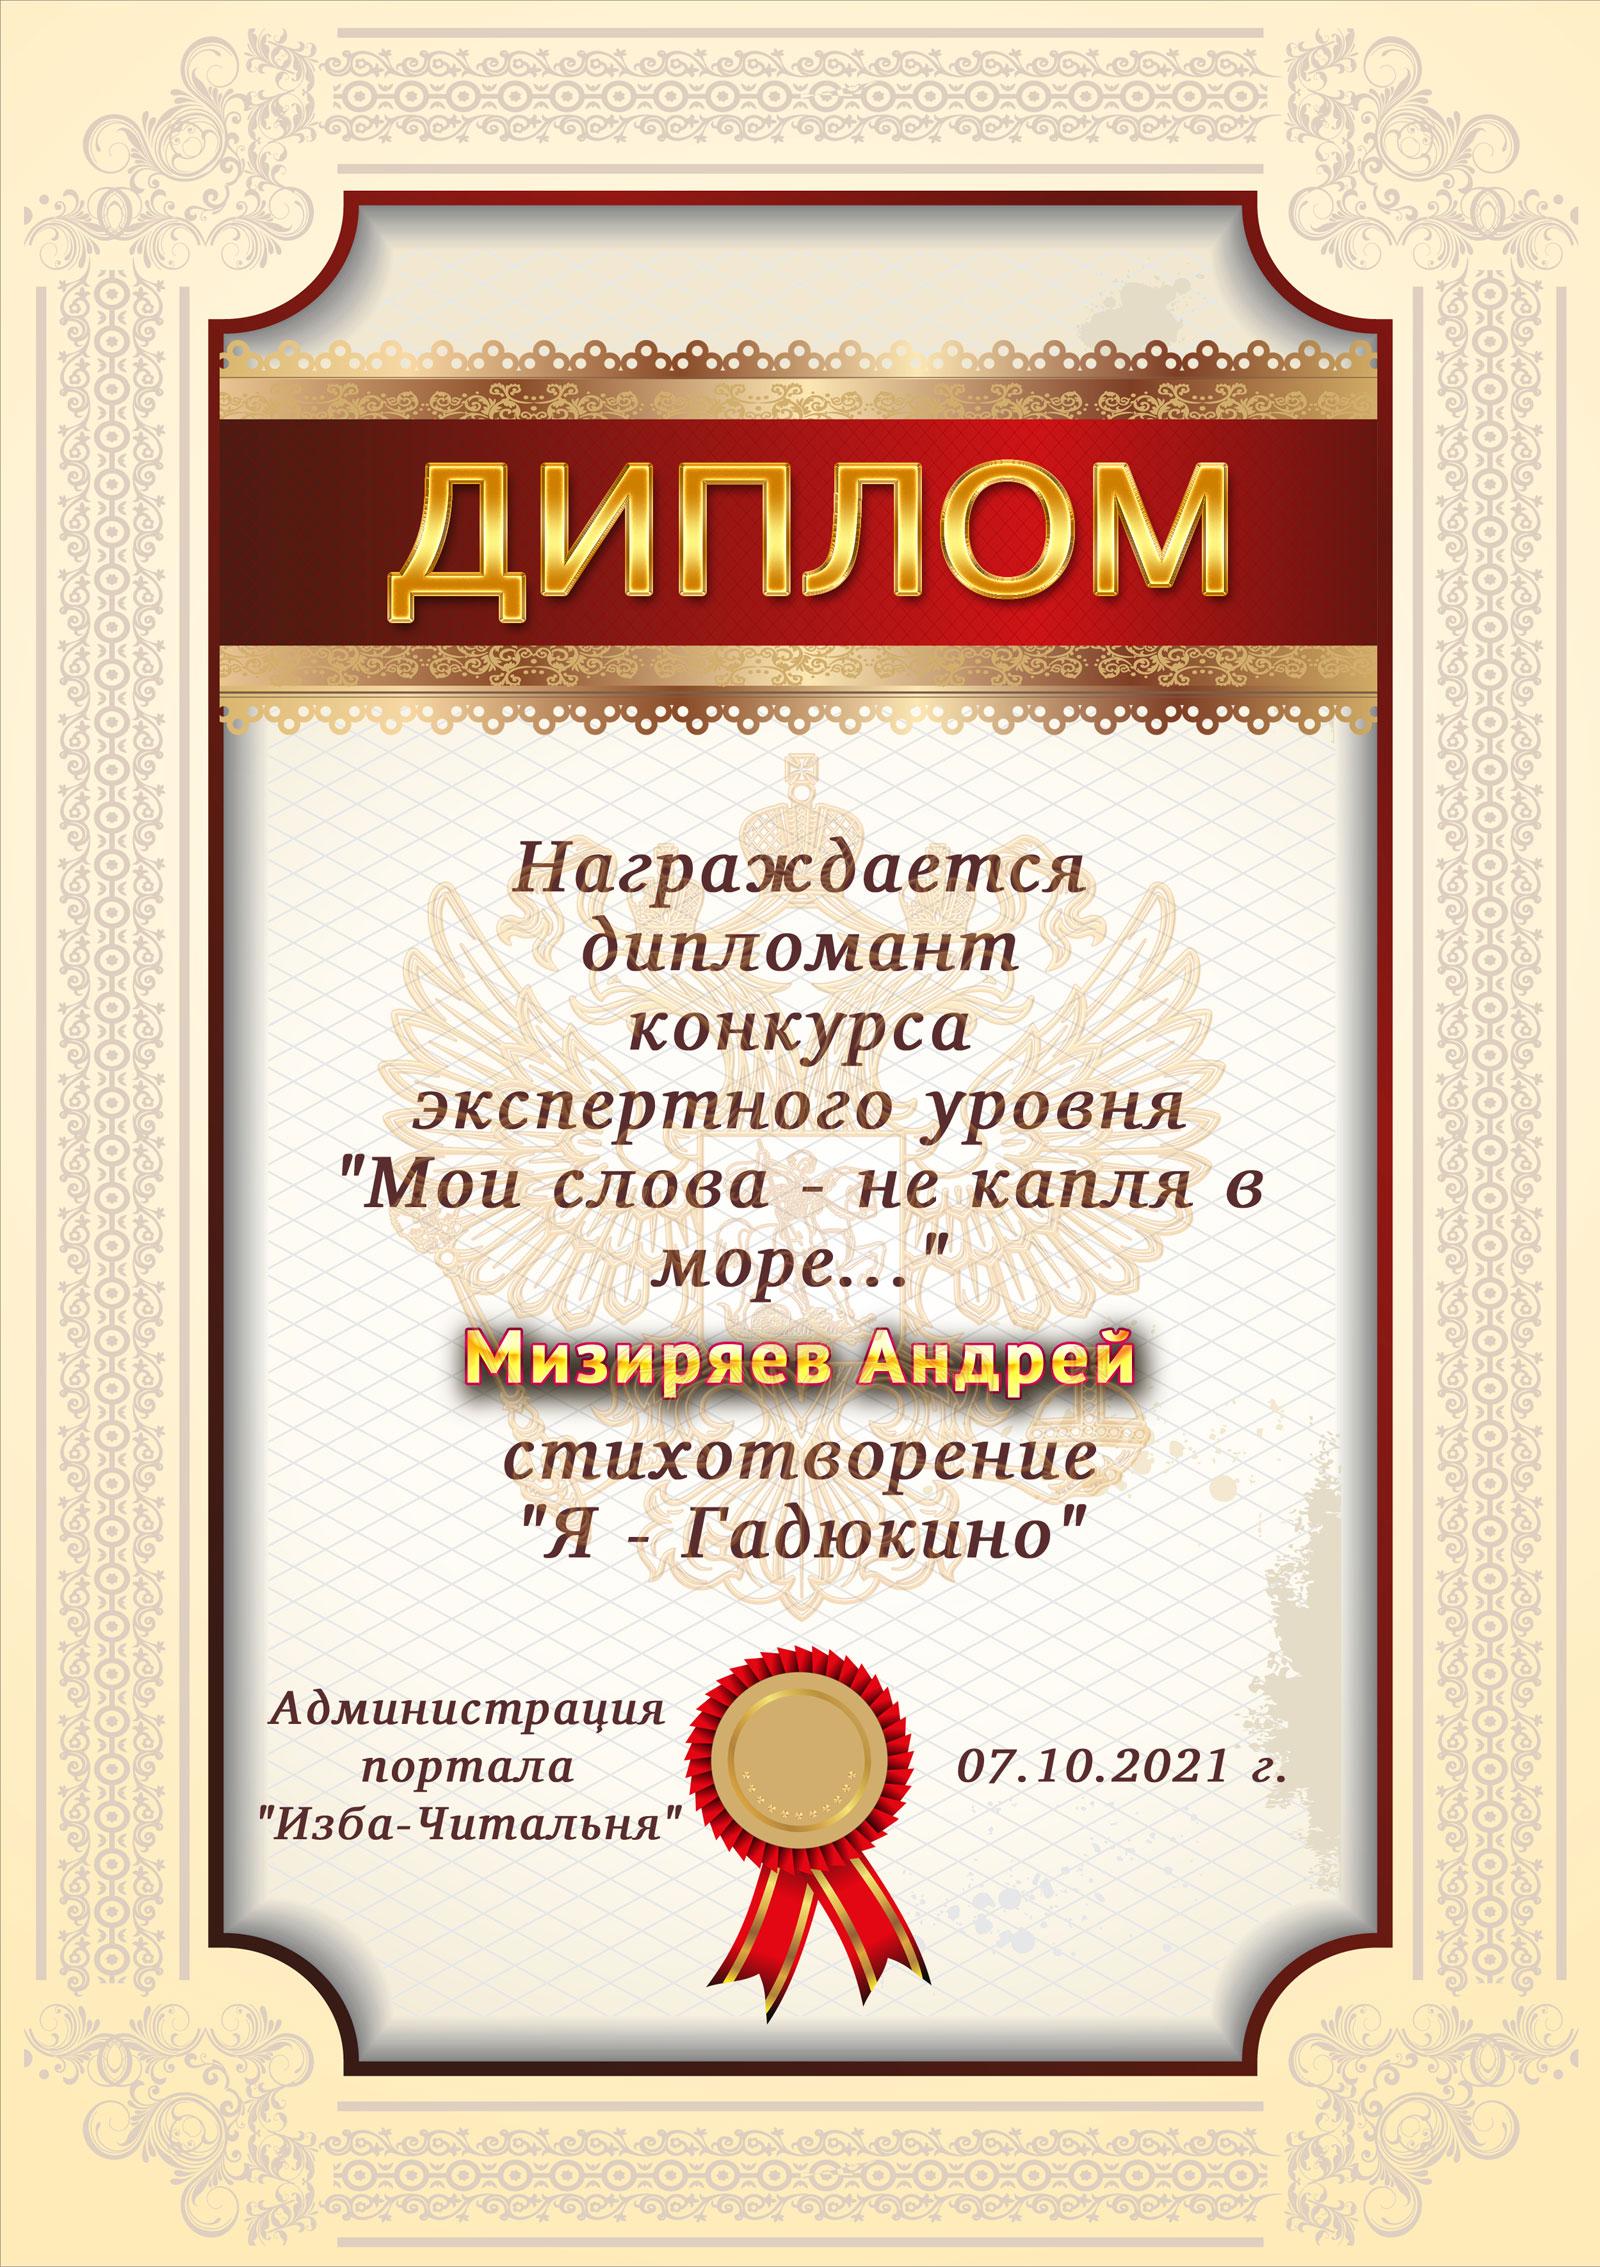 Диплом конкурса